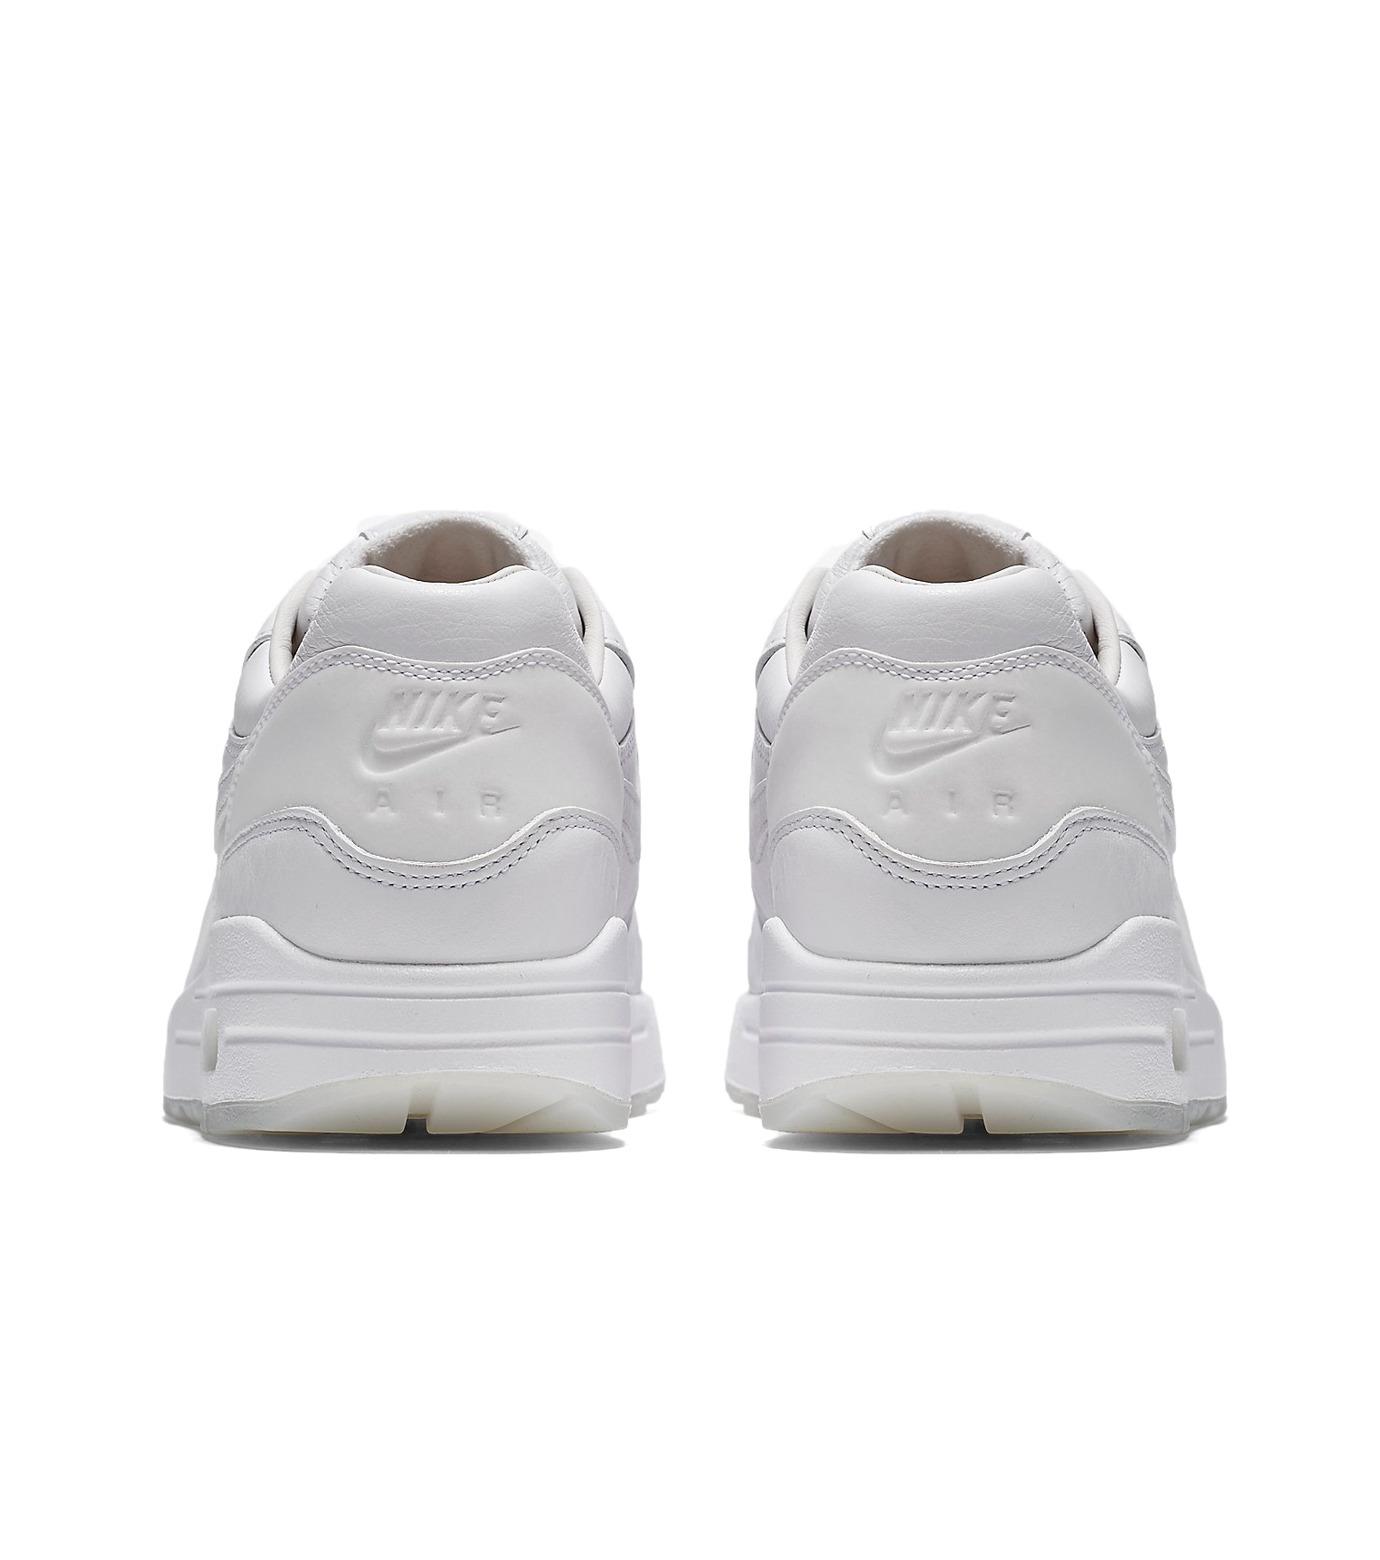 NIKE(ナイキ)のAIR MAX 1 PINNACLE-WHITE(シューズ/shoes)-859554-100-4 拡大詳細画像5